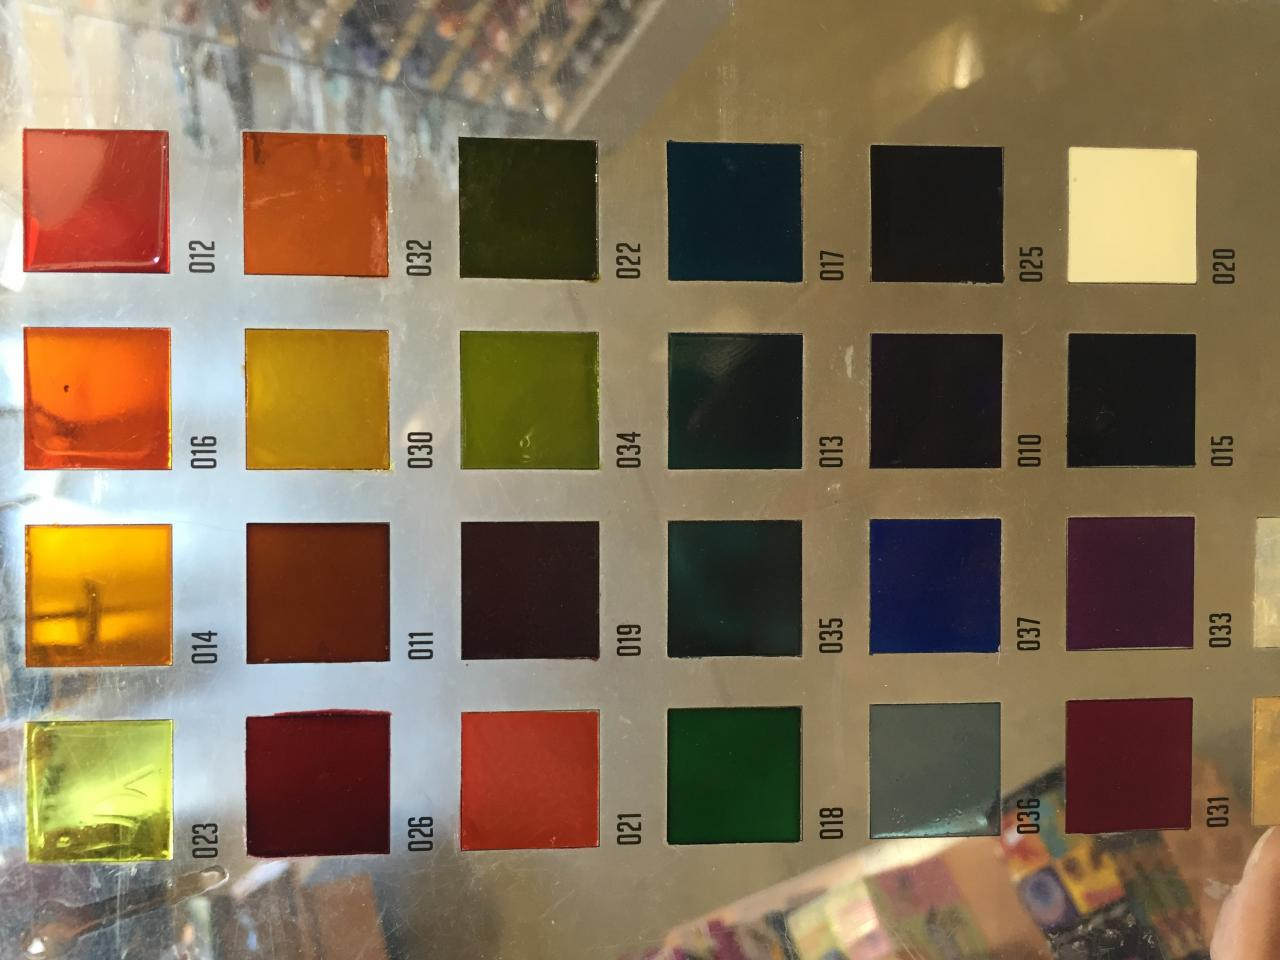 Nuancier de peinture spéciale verre translucide